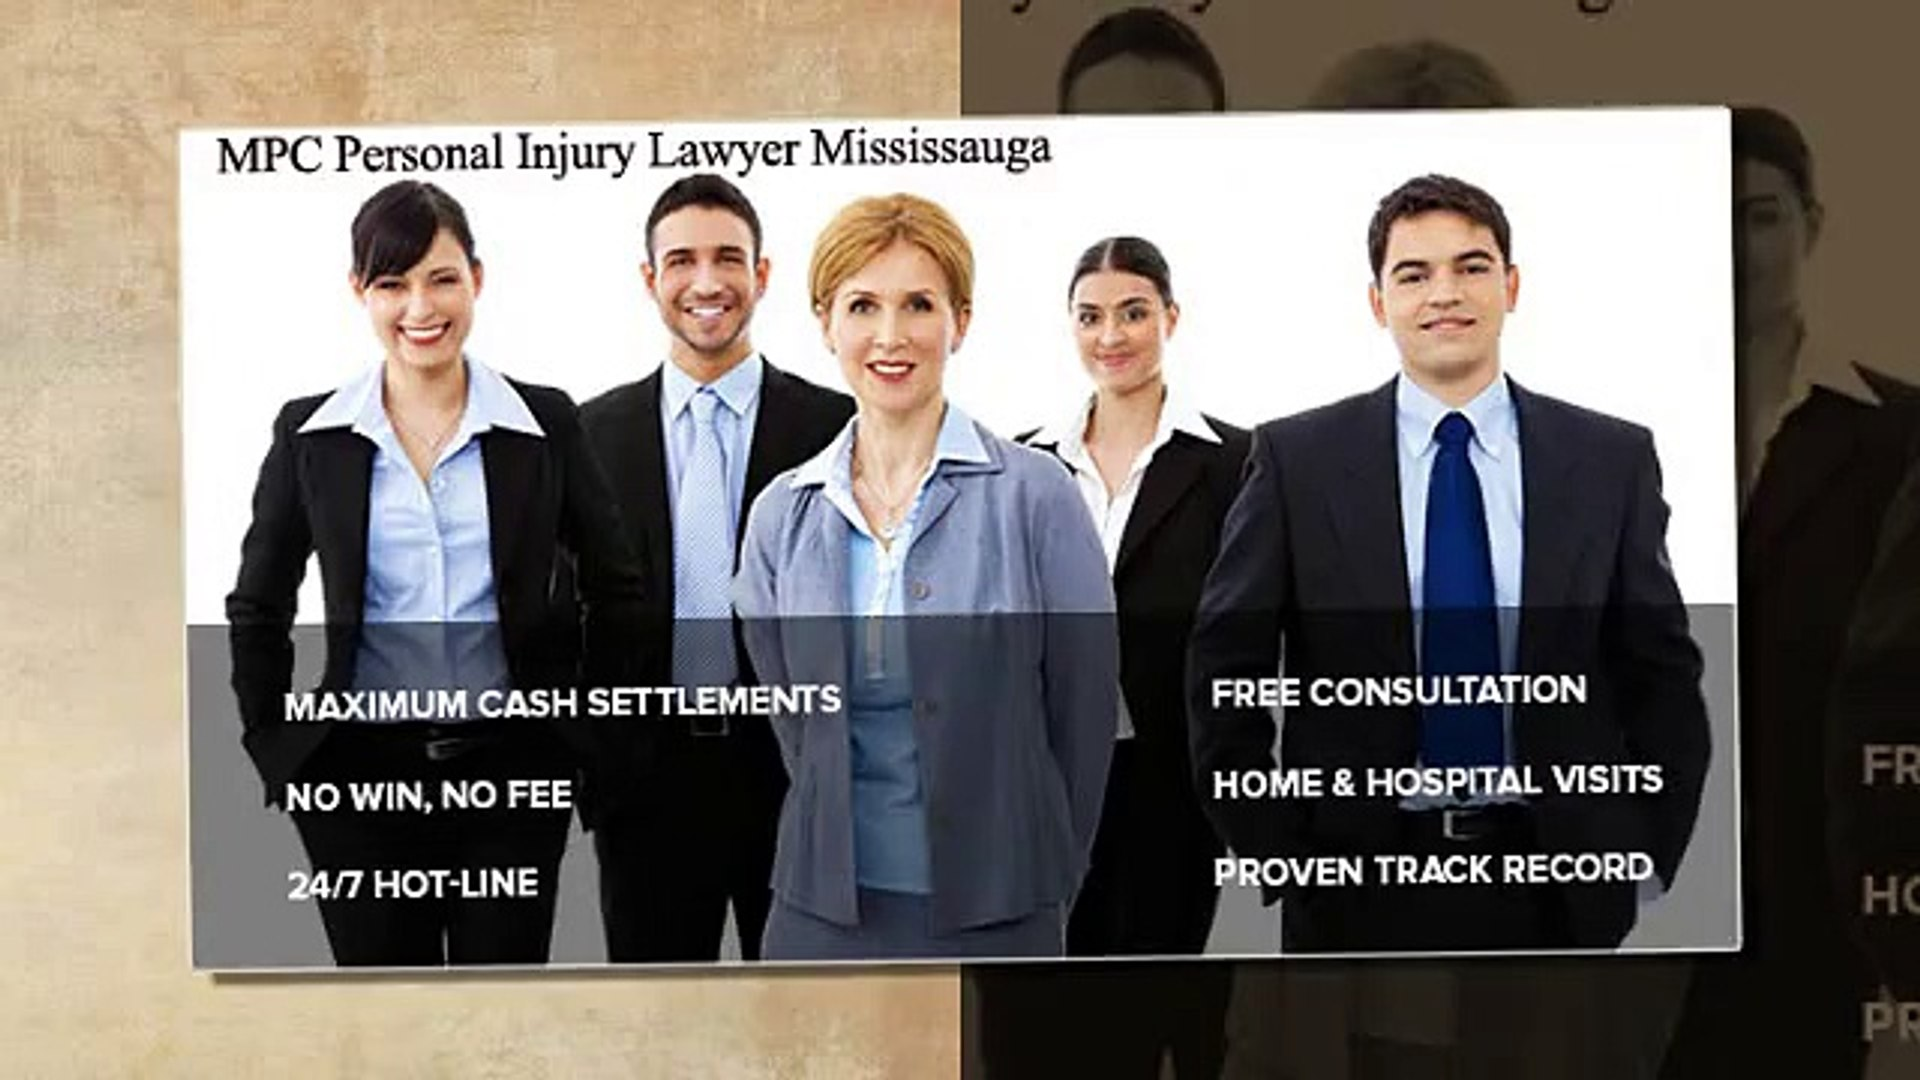 Personal Injury Lawyer Mississauga - MPC Personal Injury Lawyer 289-639-2024